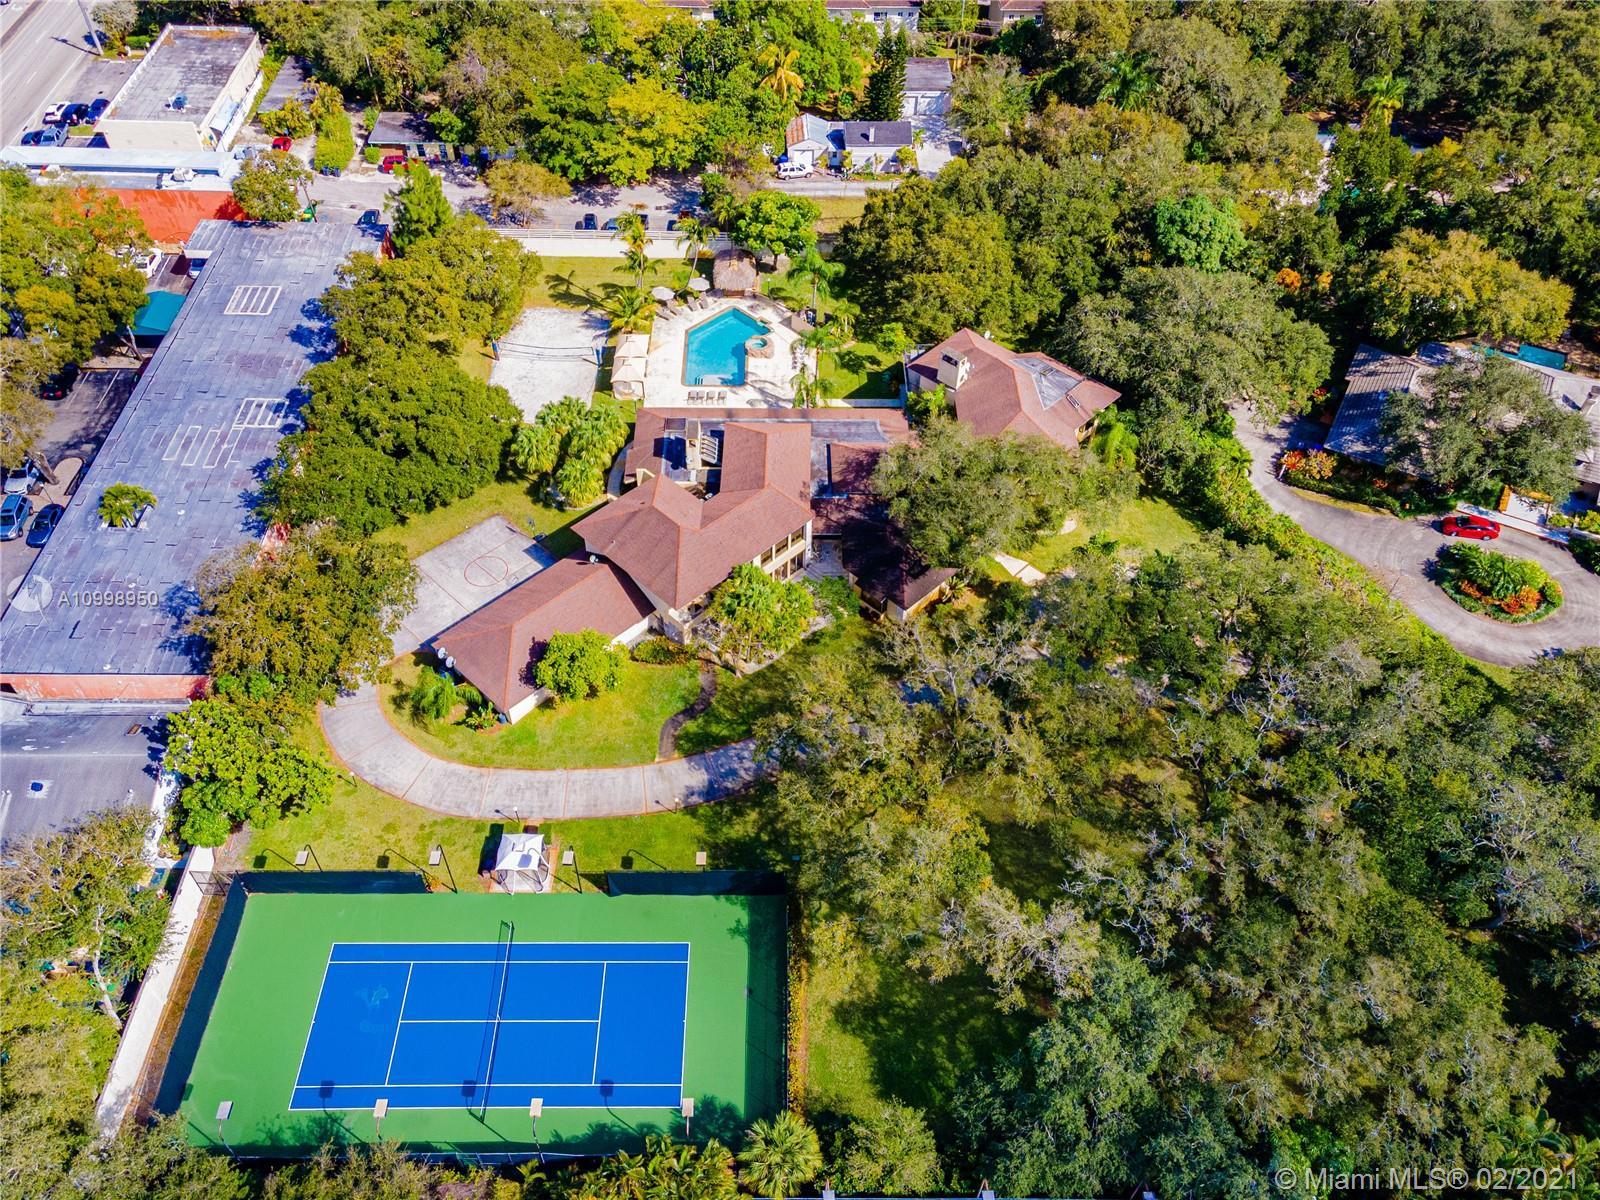 Emerald Hills - 3990 N 32nd Ter, Hollywood, FL 33021